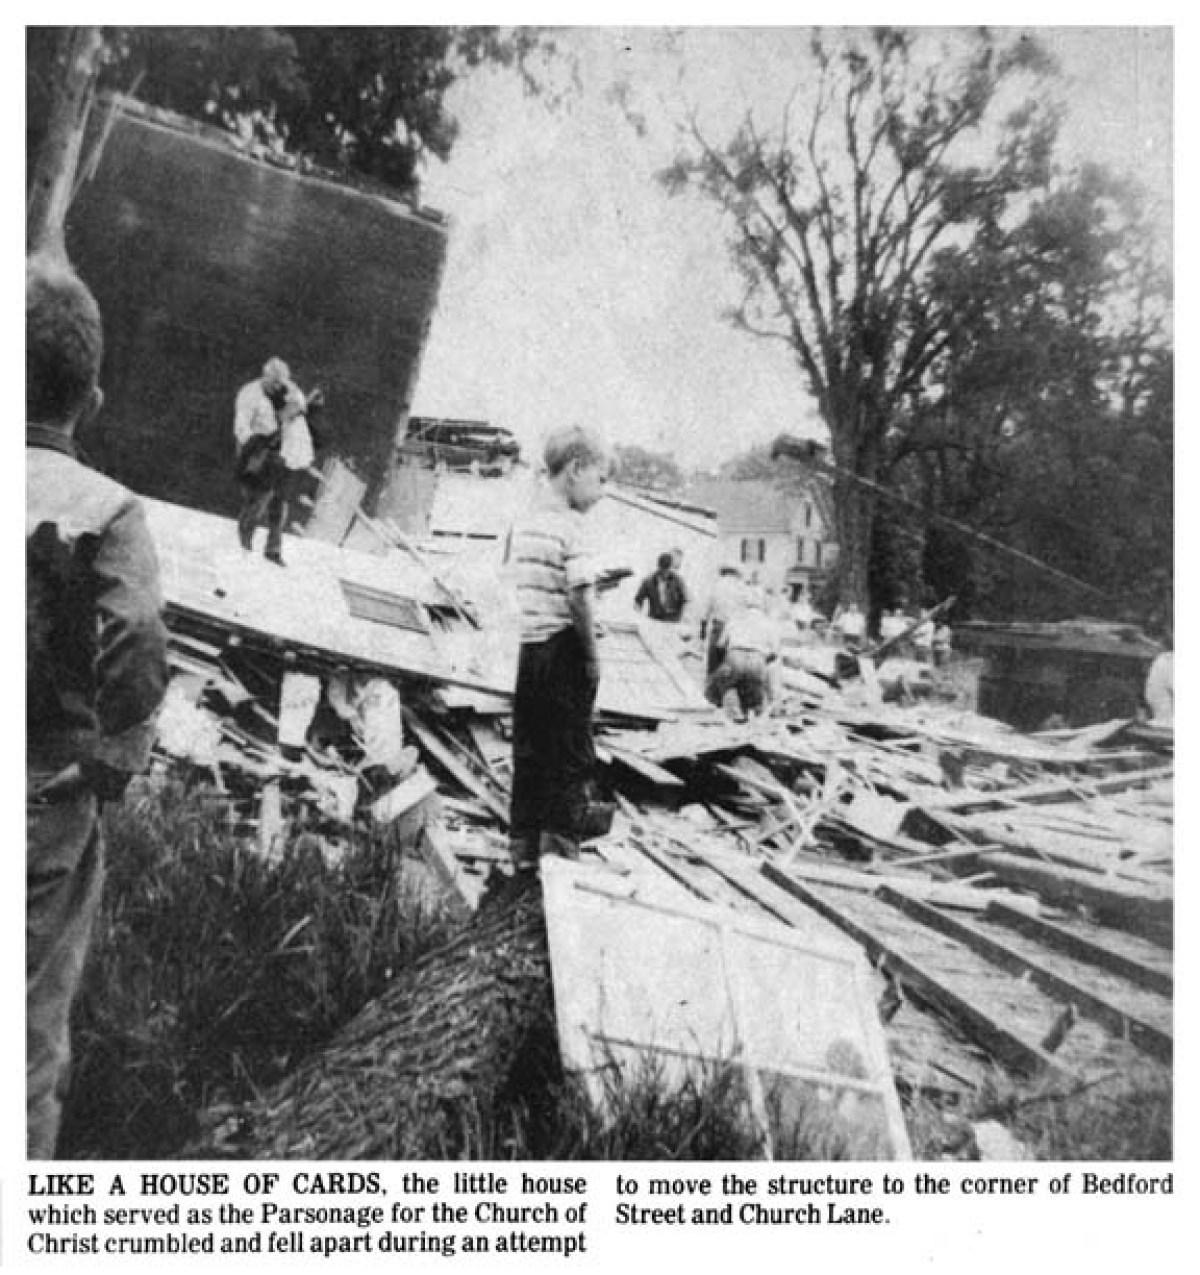 Rev. Sidney King's destroyed house